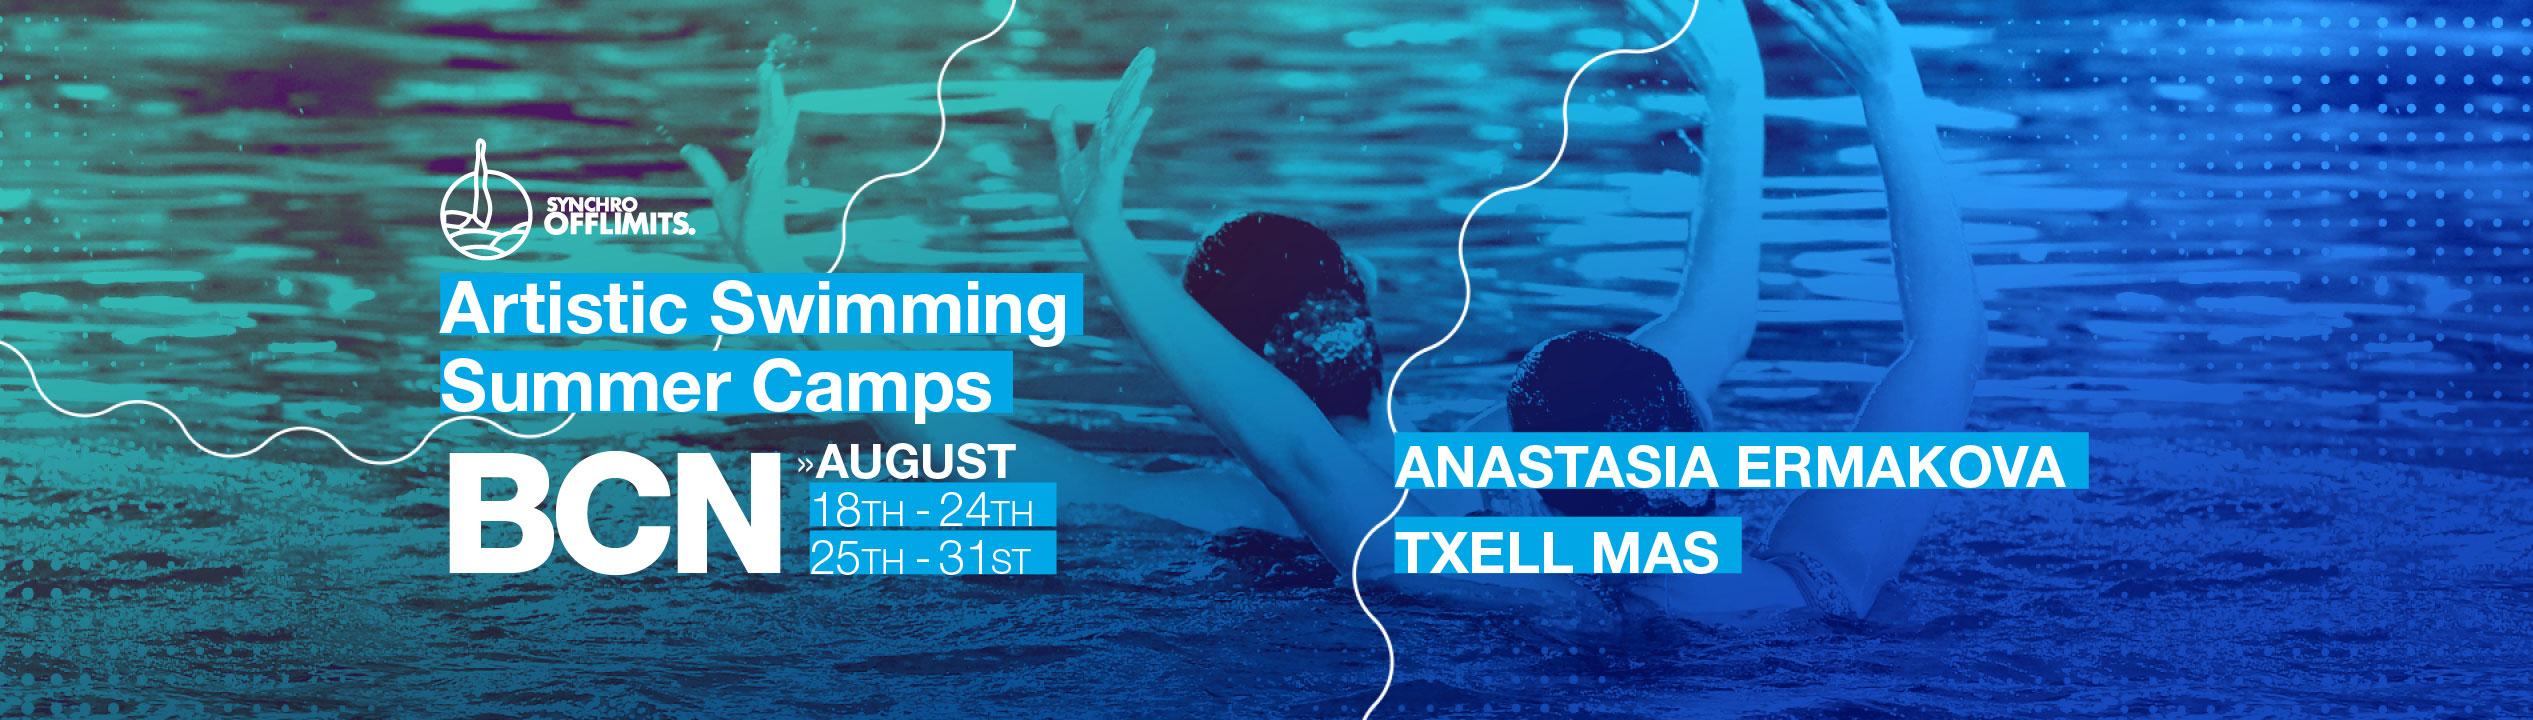 HomeSlider_ArtisticSwimming_BCN_prova